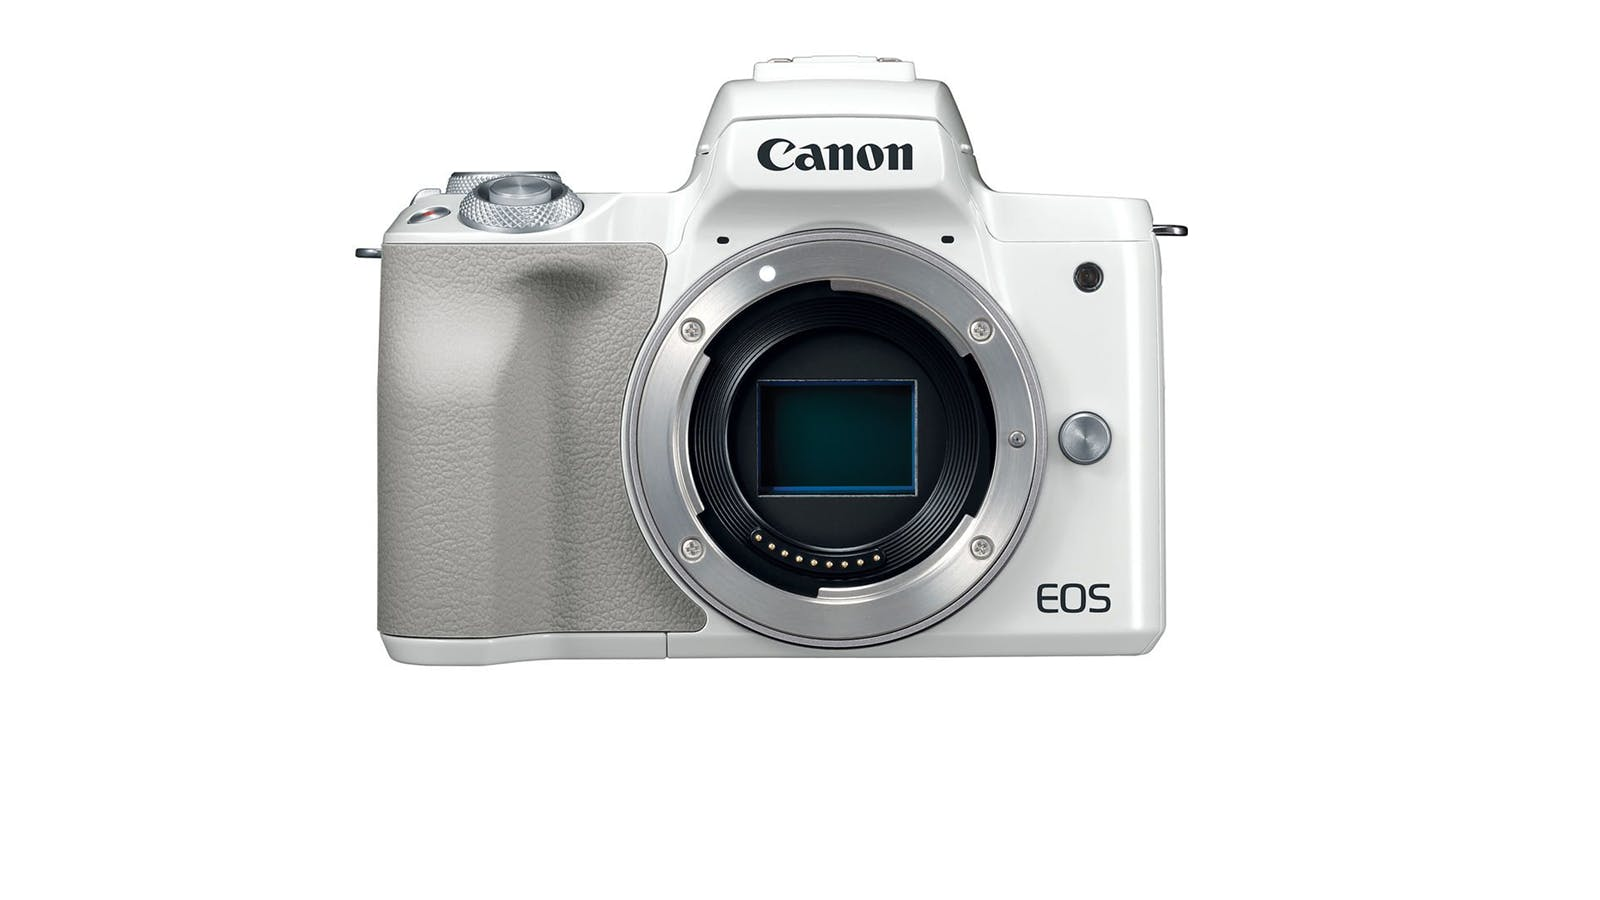 Home :: Smart Tech & Phones :: Cameras :: Mirrorless Cameras :: Canon EOS  M50 Mirrorless Digital Camera (Body) - White